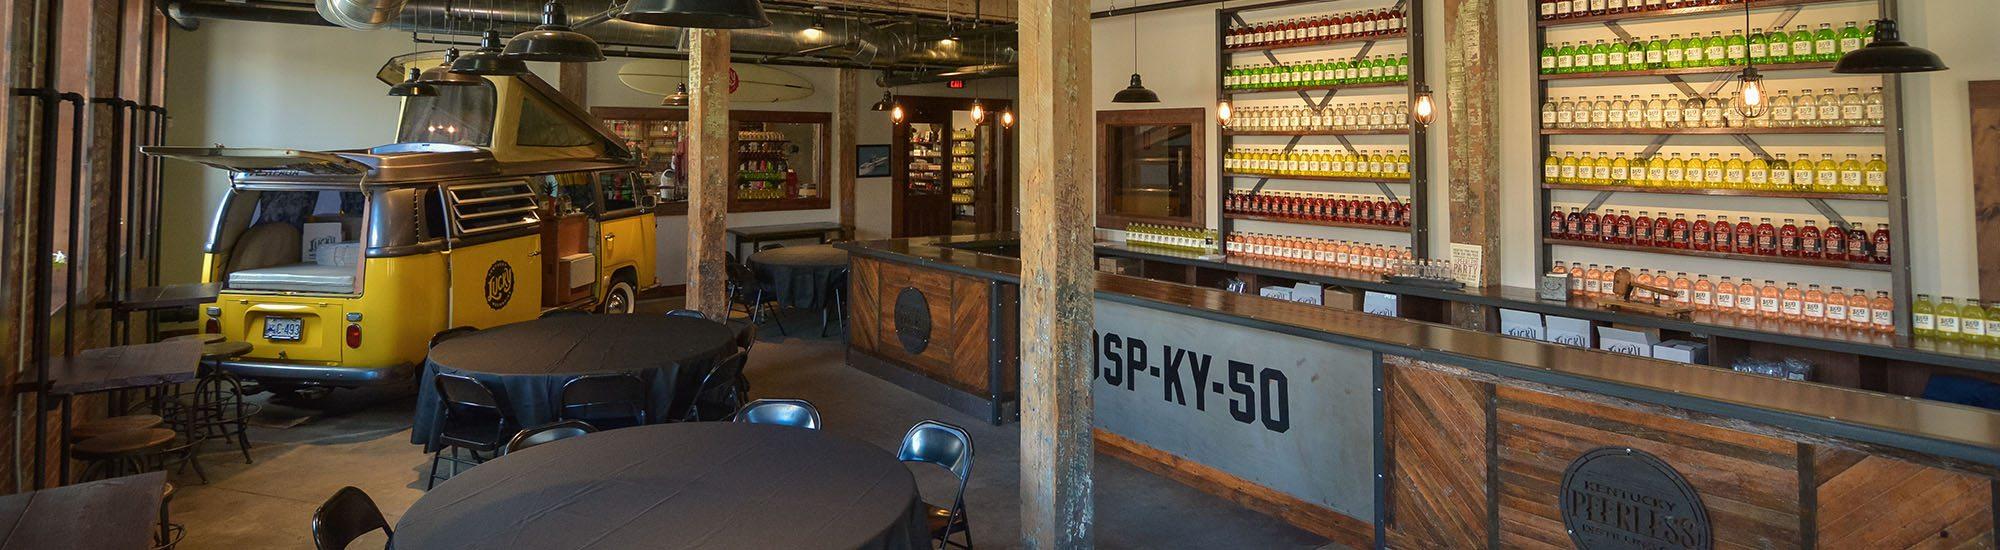 Event space rental distillery louisville